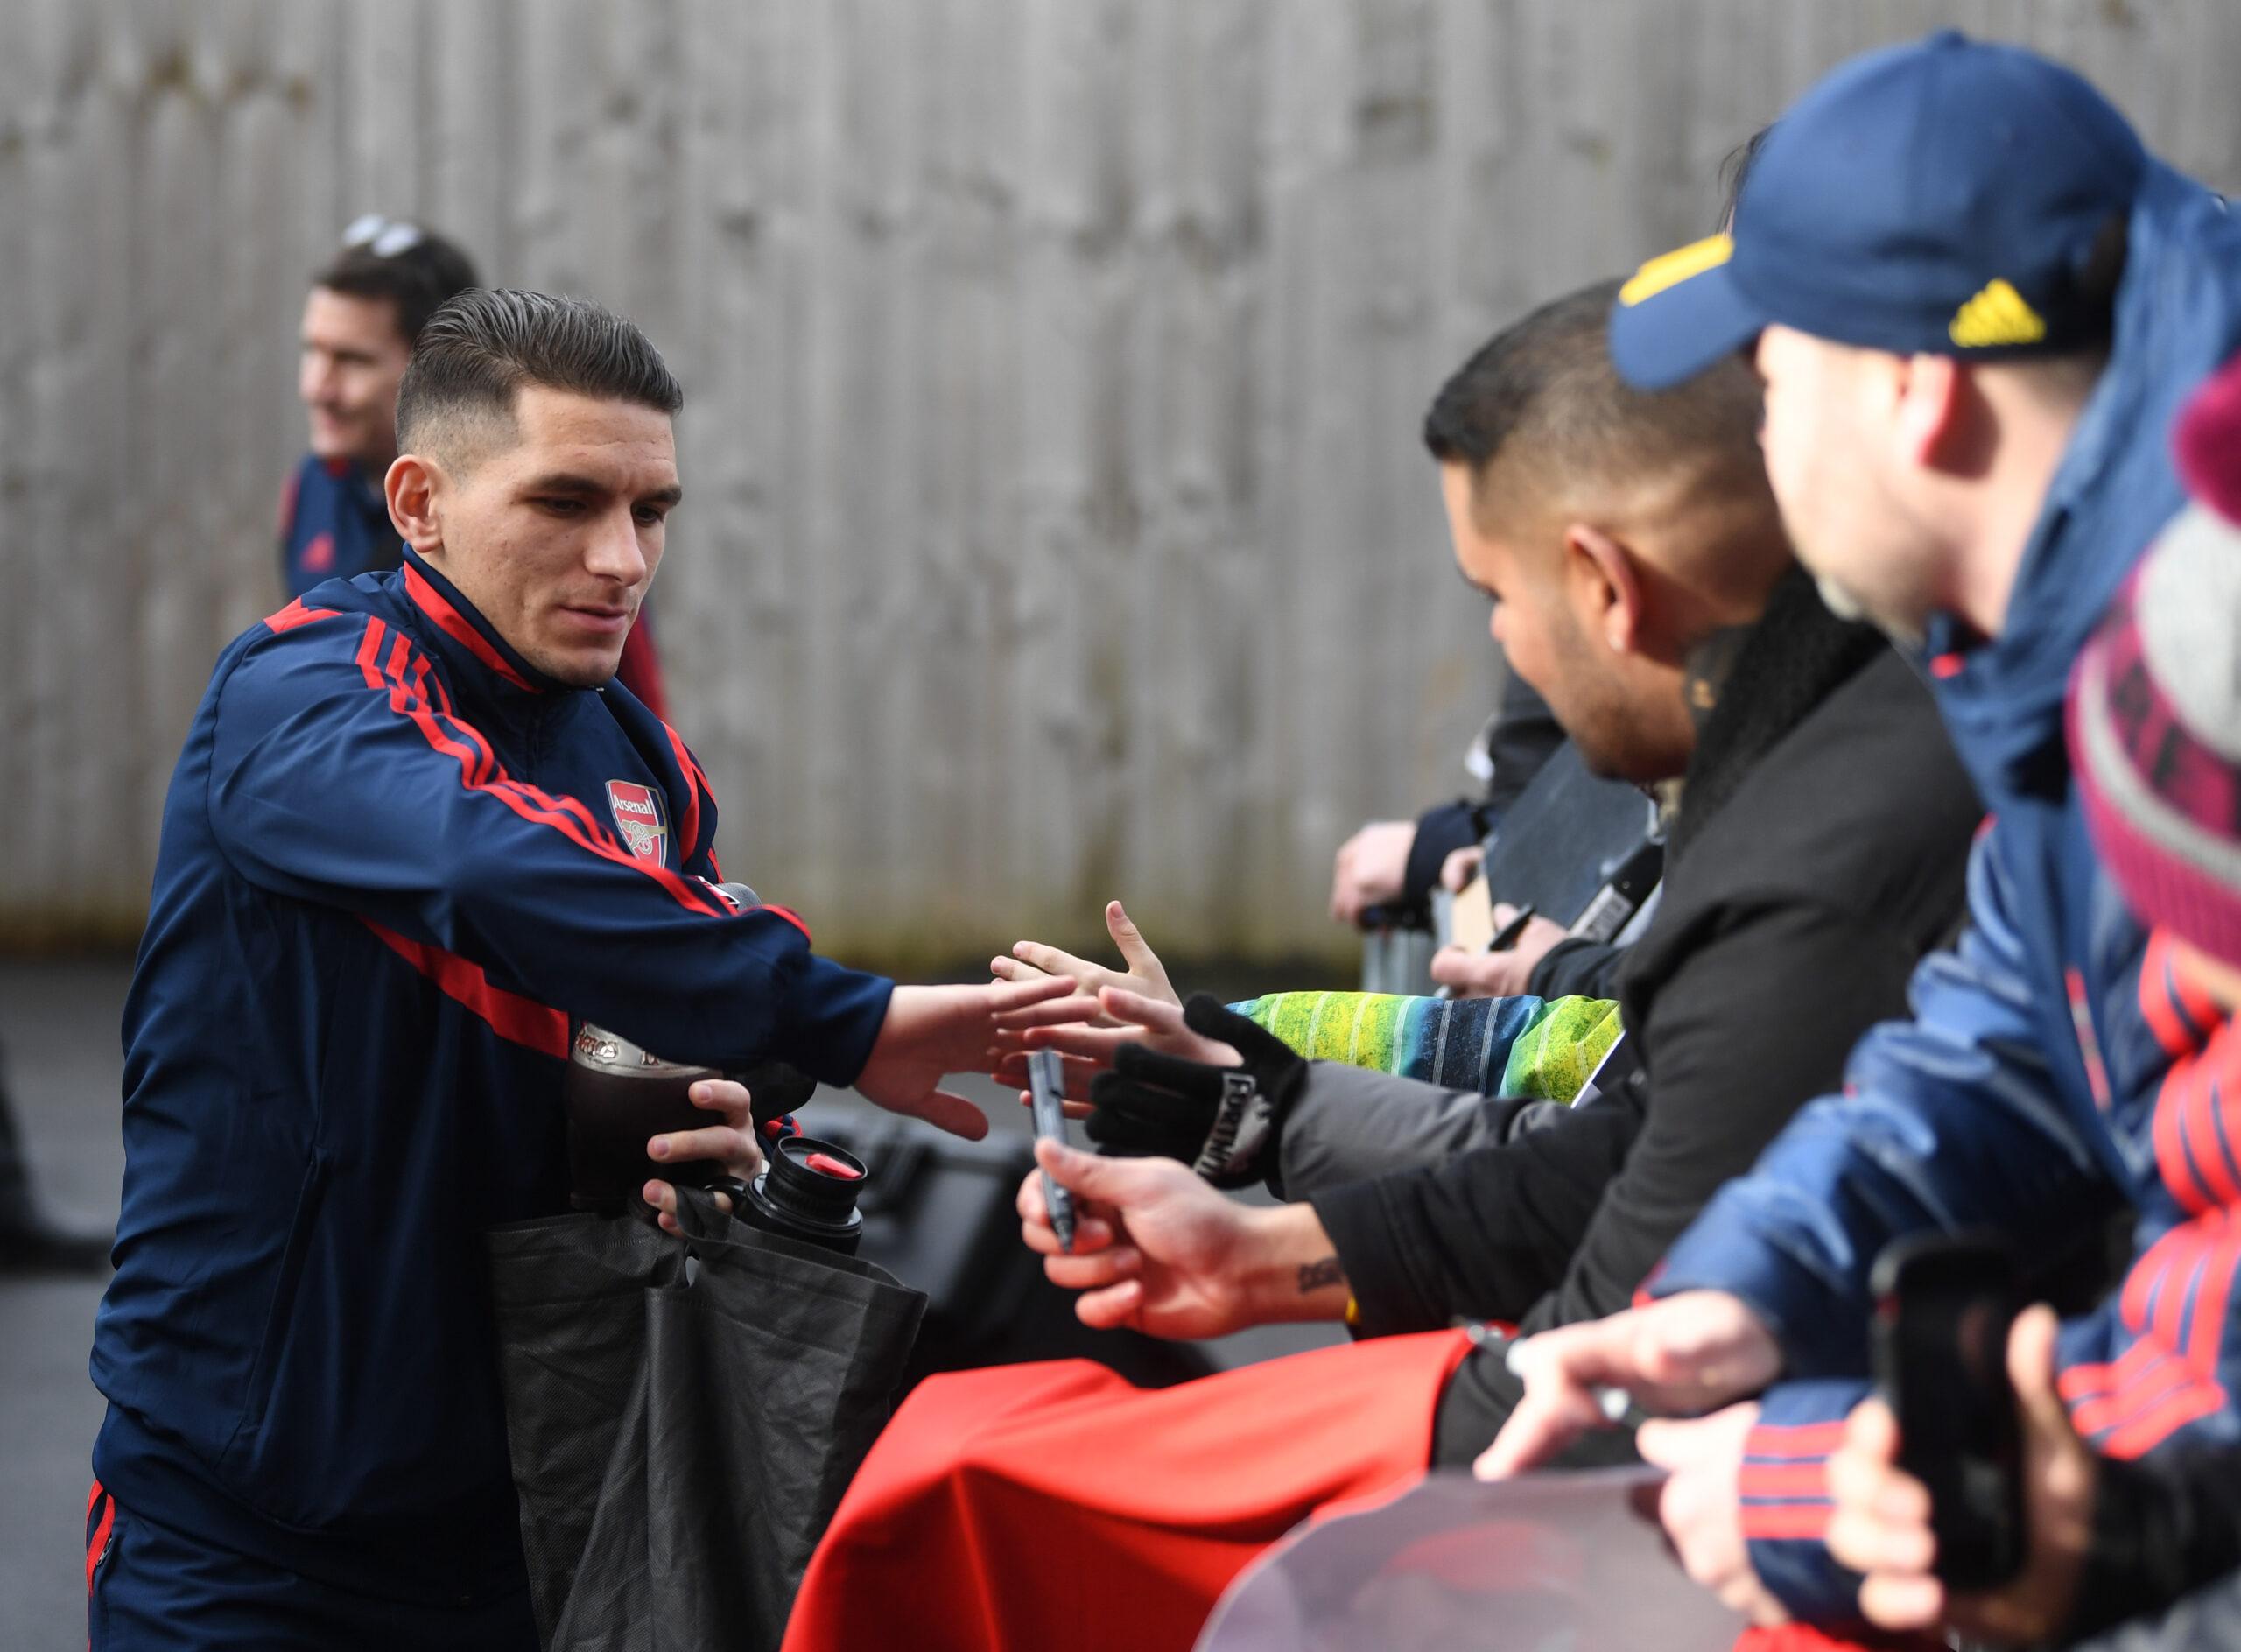 El Arsenal ofrece a Torreira con una condición según The Express